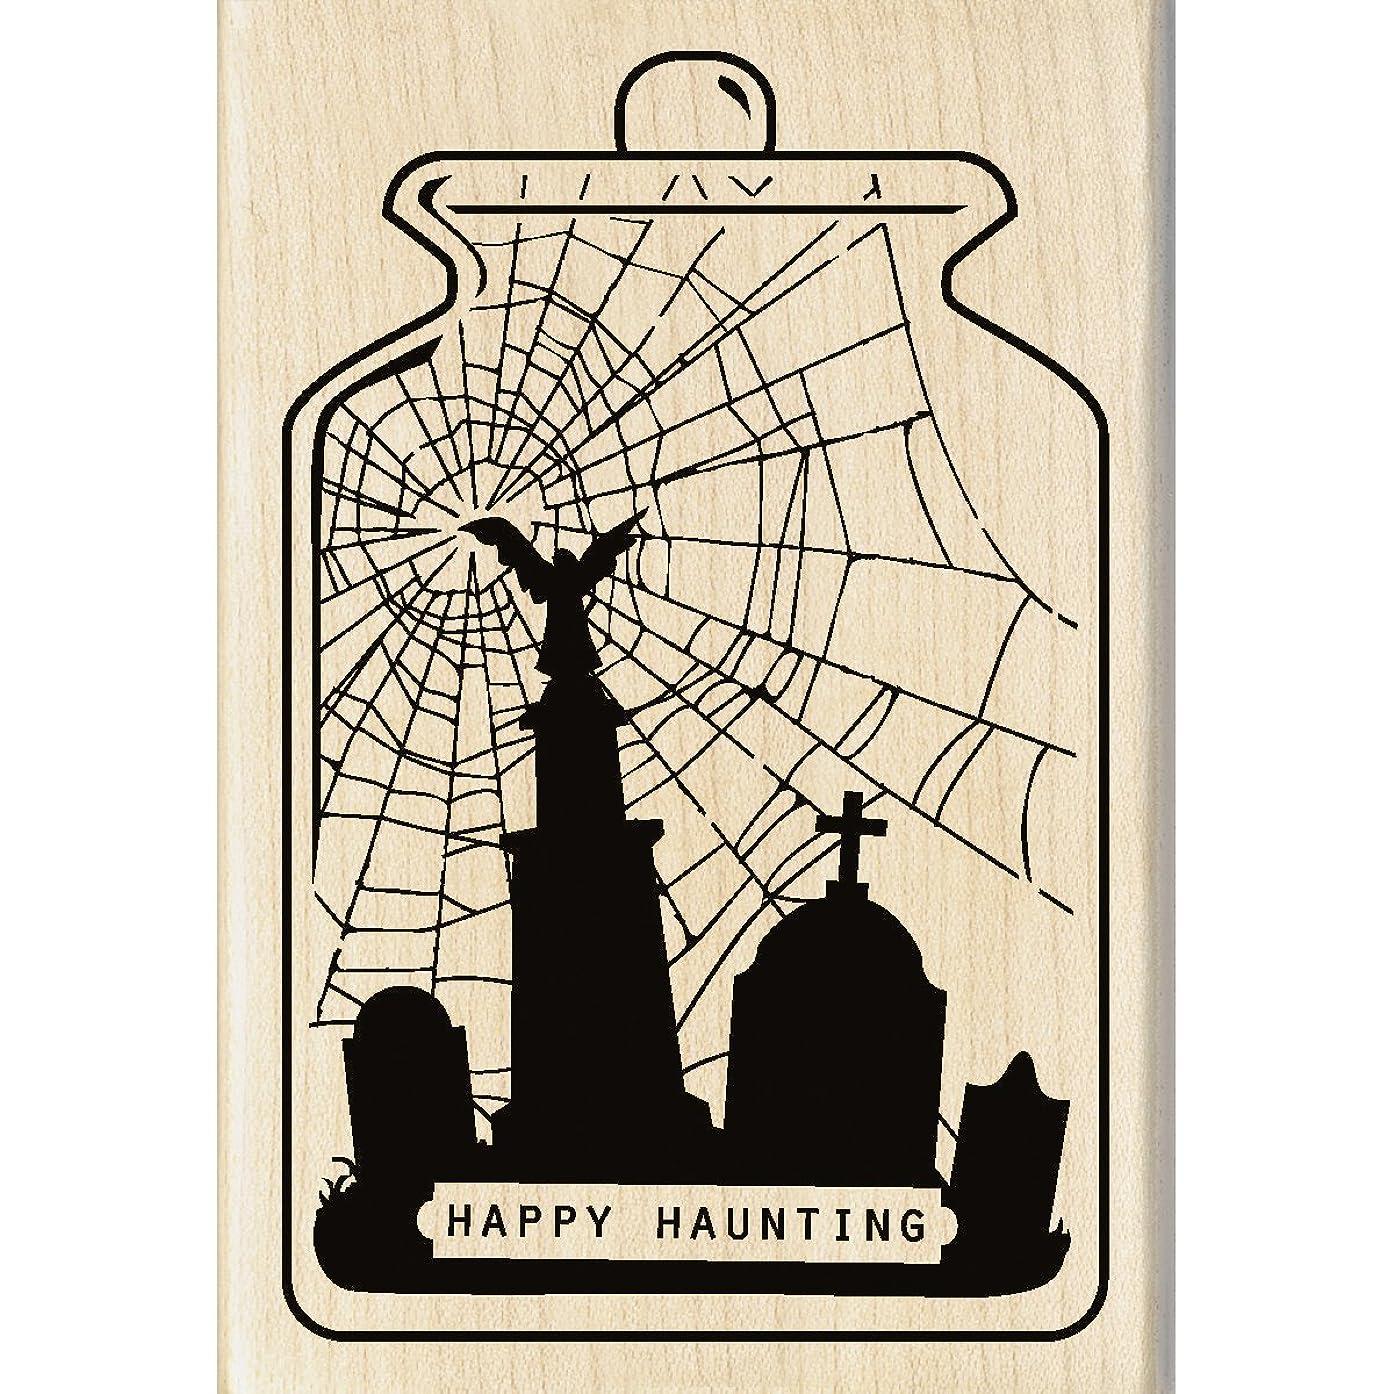 Inkadinkado 60-01094 Happy Haunting Wood Stamp, Black